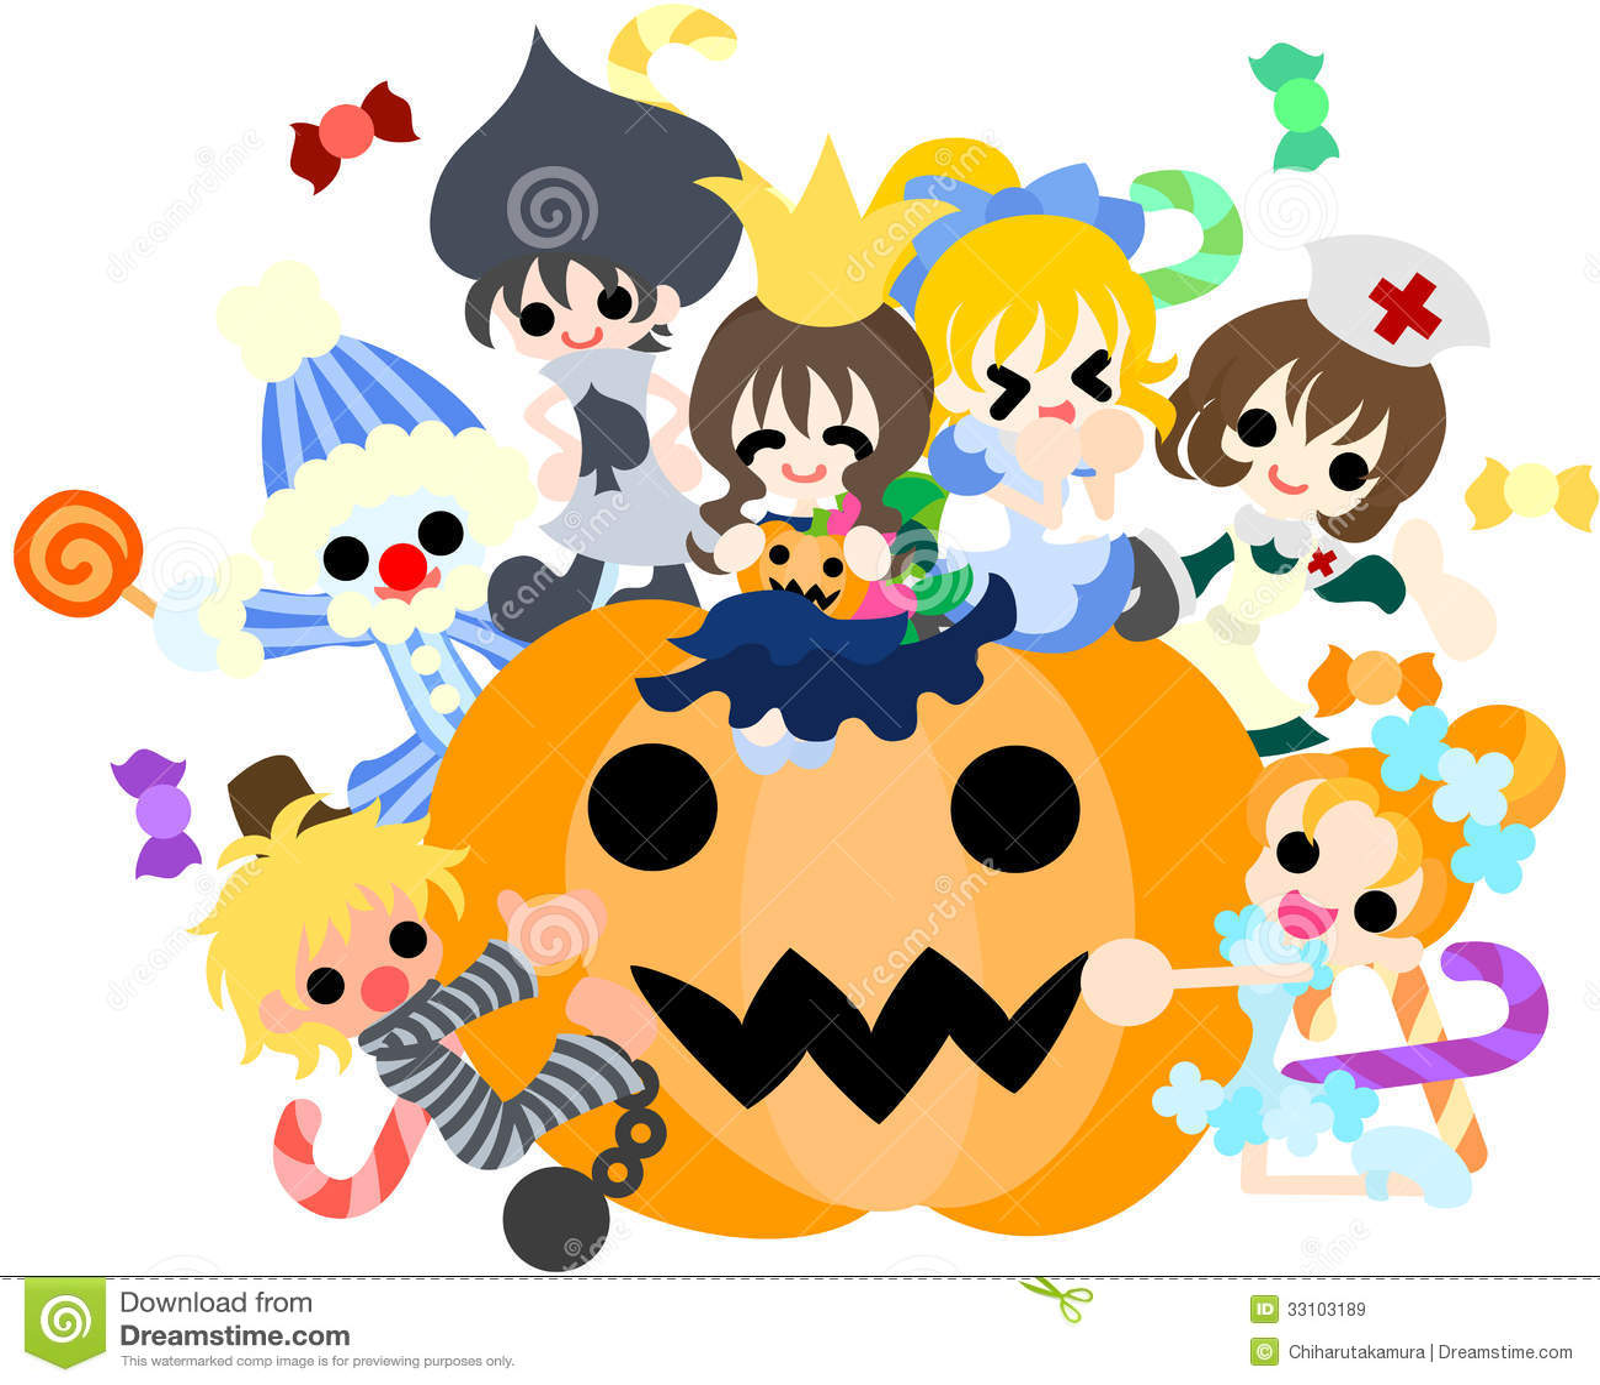 free small halloween clip art - photo #37